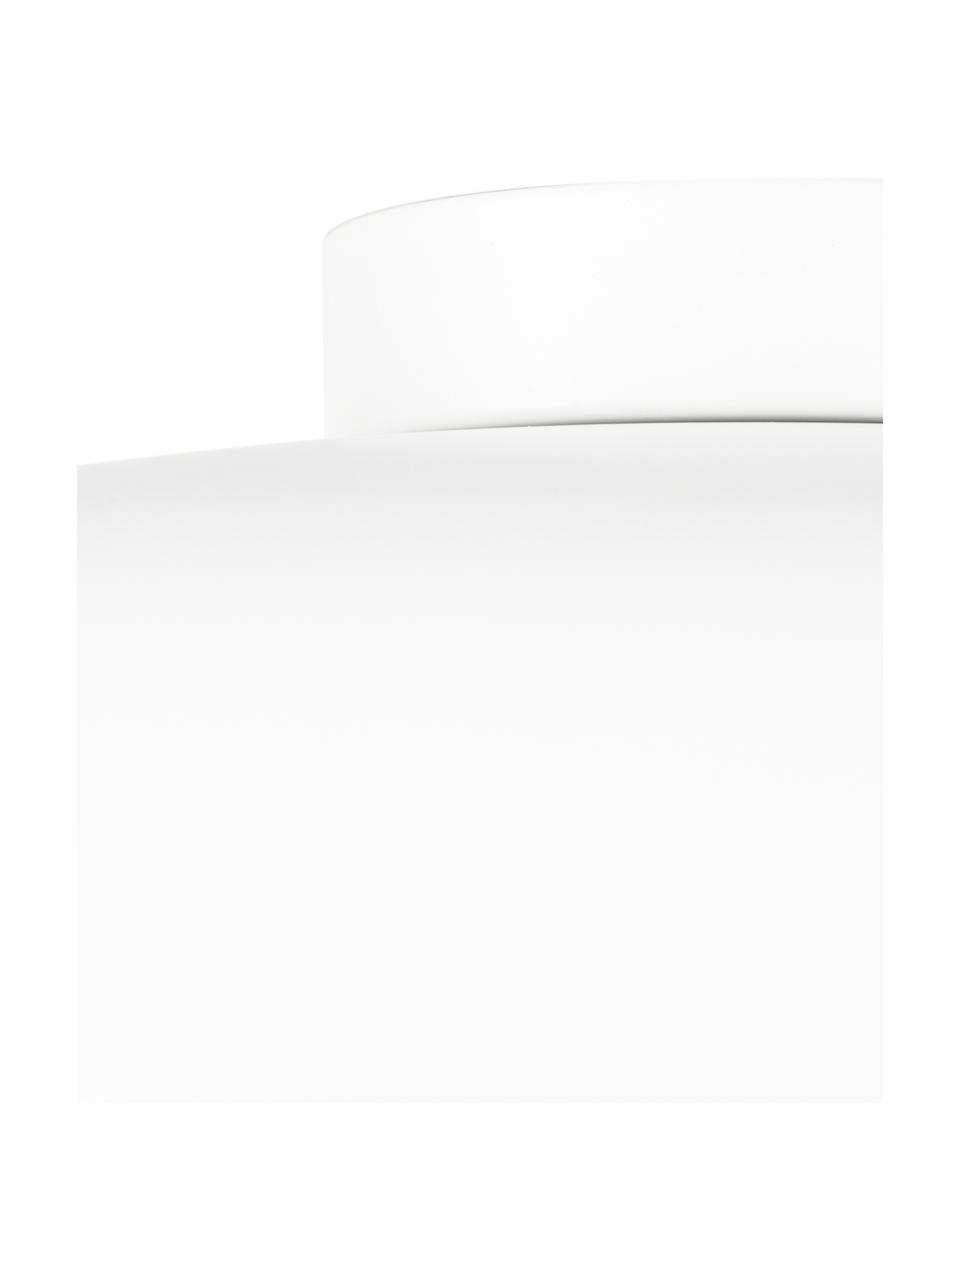 Deckenleuchte Ole aus Metall, Lampenschirm: Metall, pulverbeschichtet, Baldachin: Metall, pulverbeschichtet, Diffusorscheibe: Acryl, Weiß, matt, Ø 35 x H 18 cm